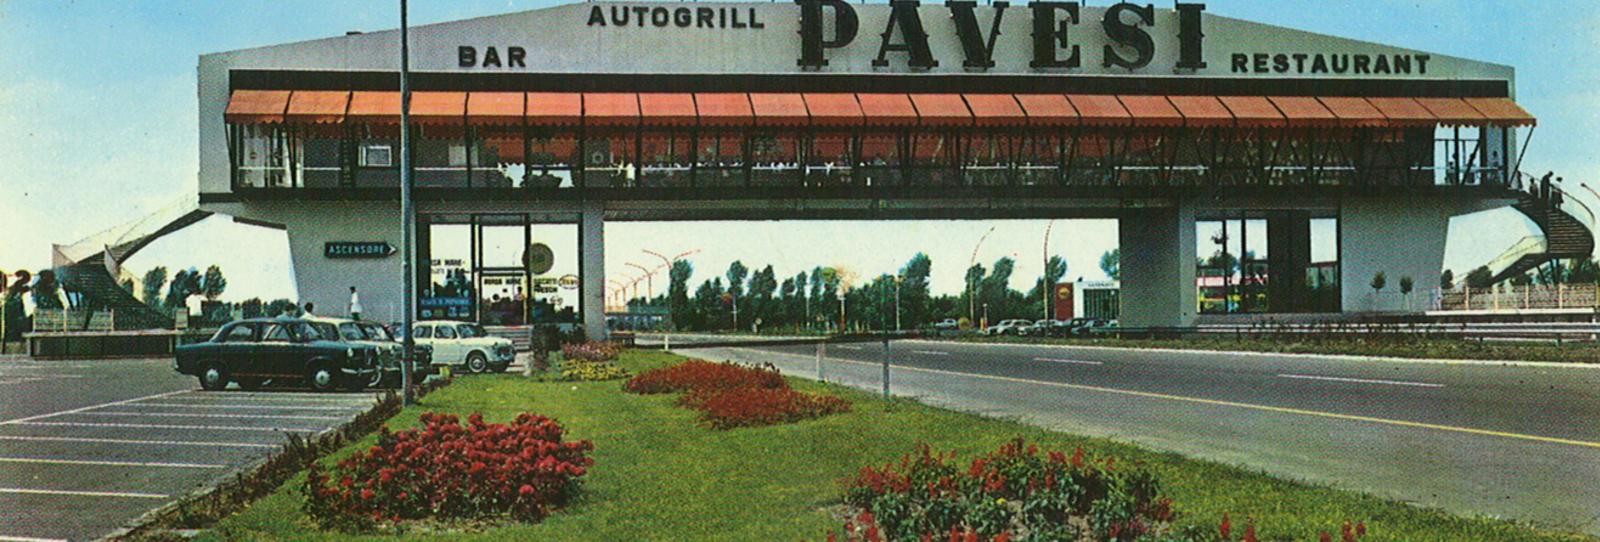 Ponte Autogrill Il Futuro Verso D'ardaUn Fiorenzuola 0kPO8nw